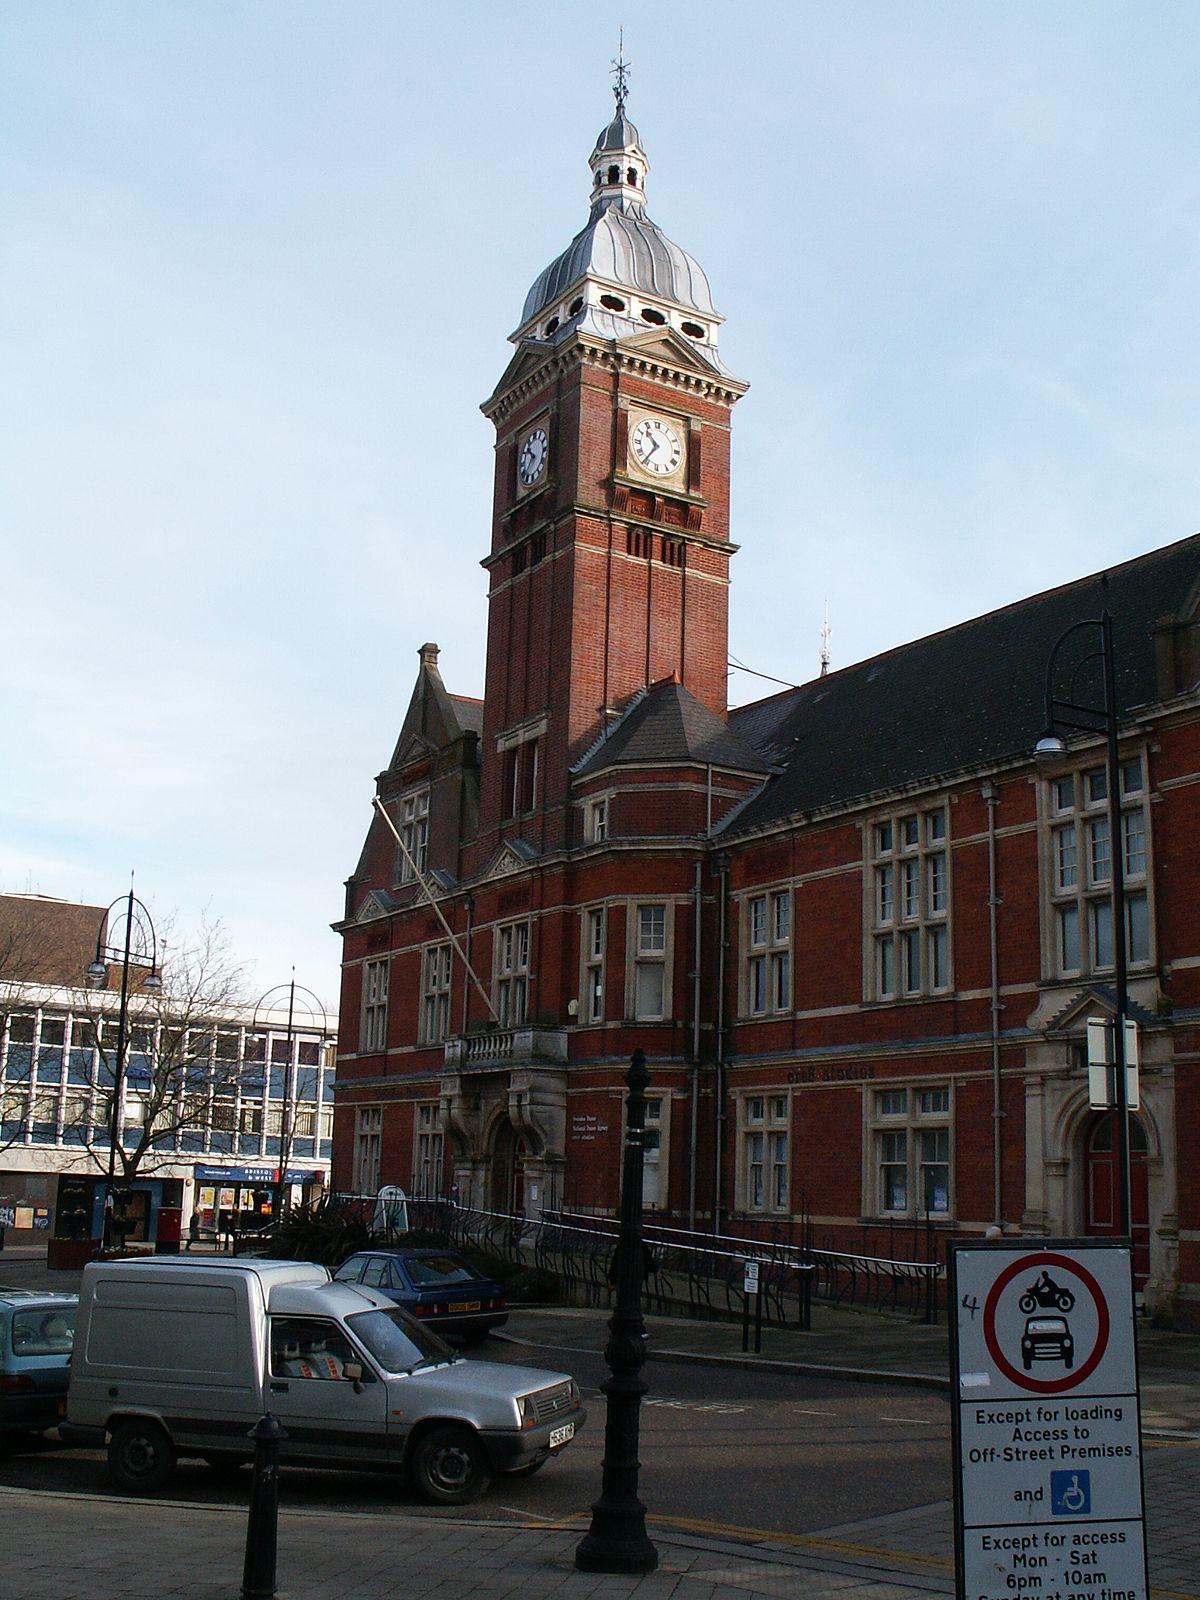 Swindon Town Hall - Wikipedia